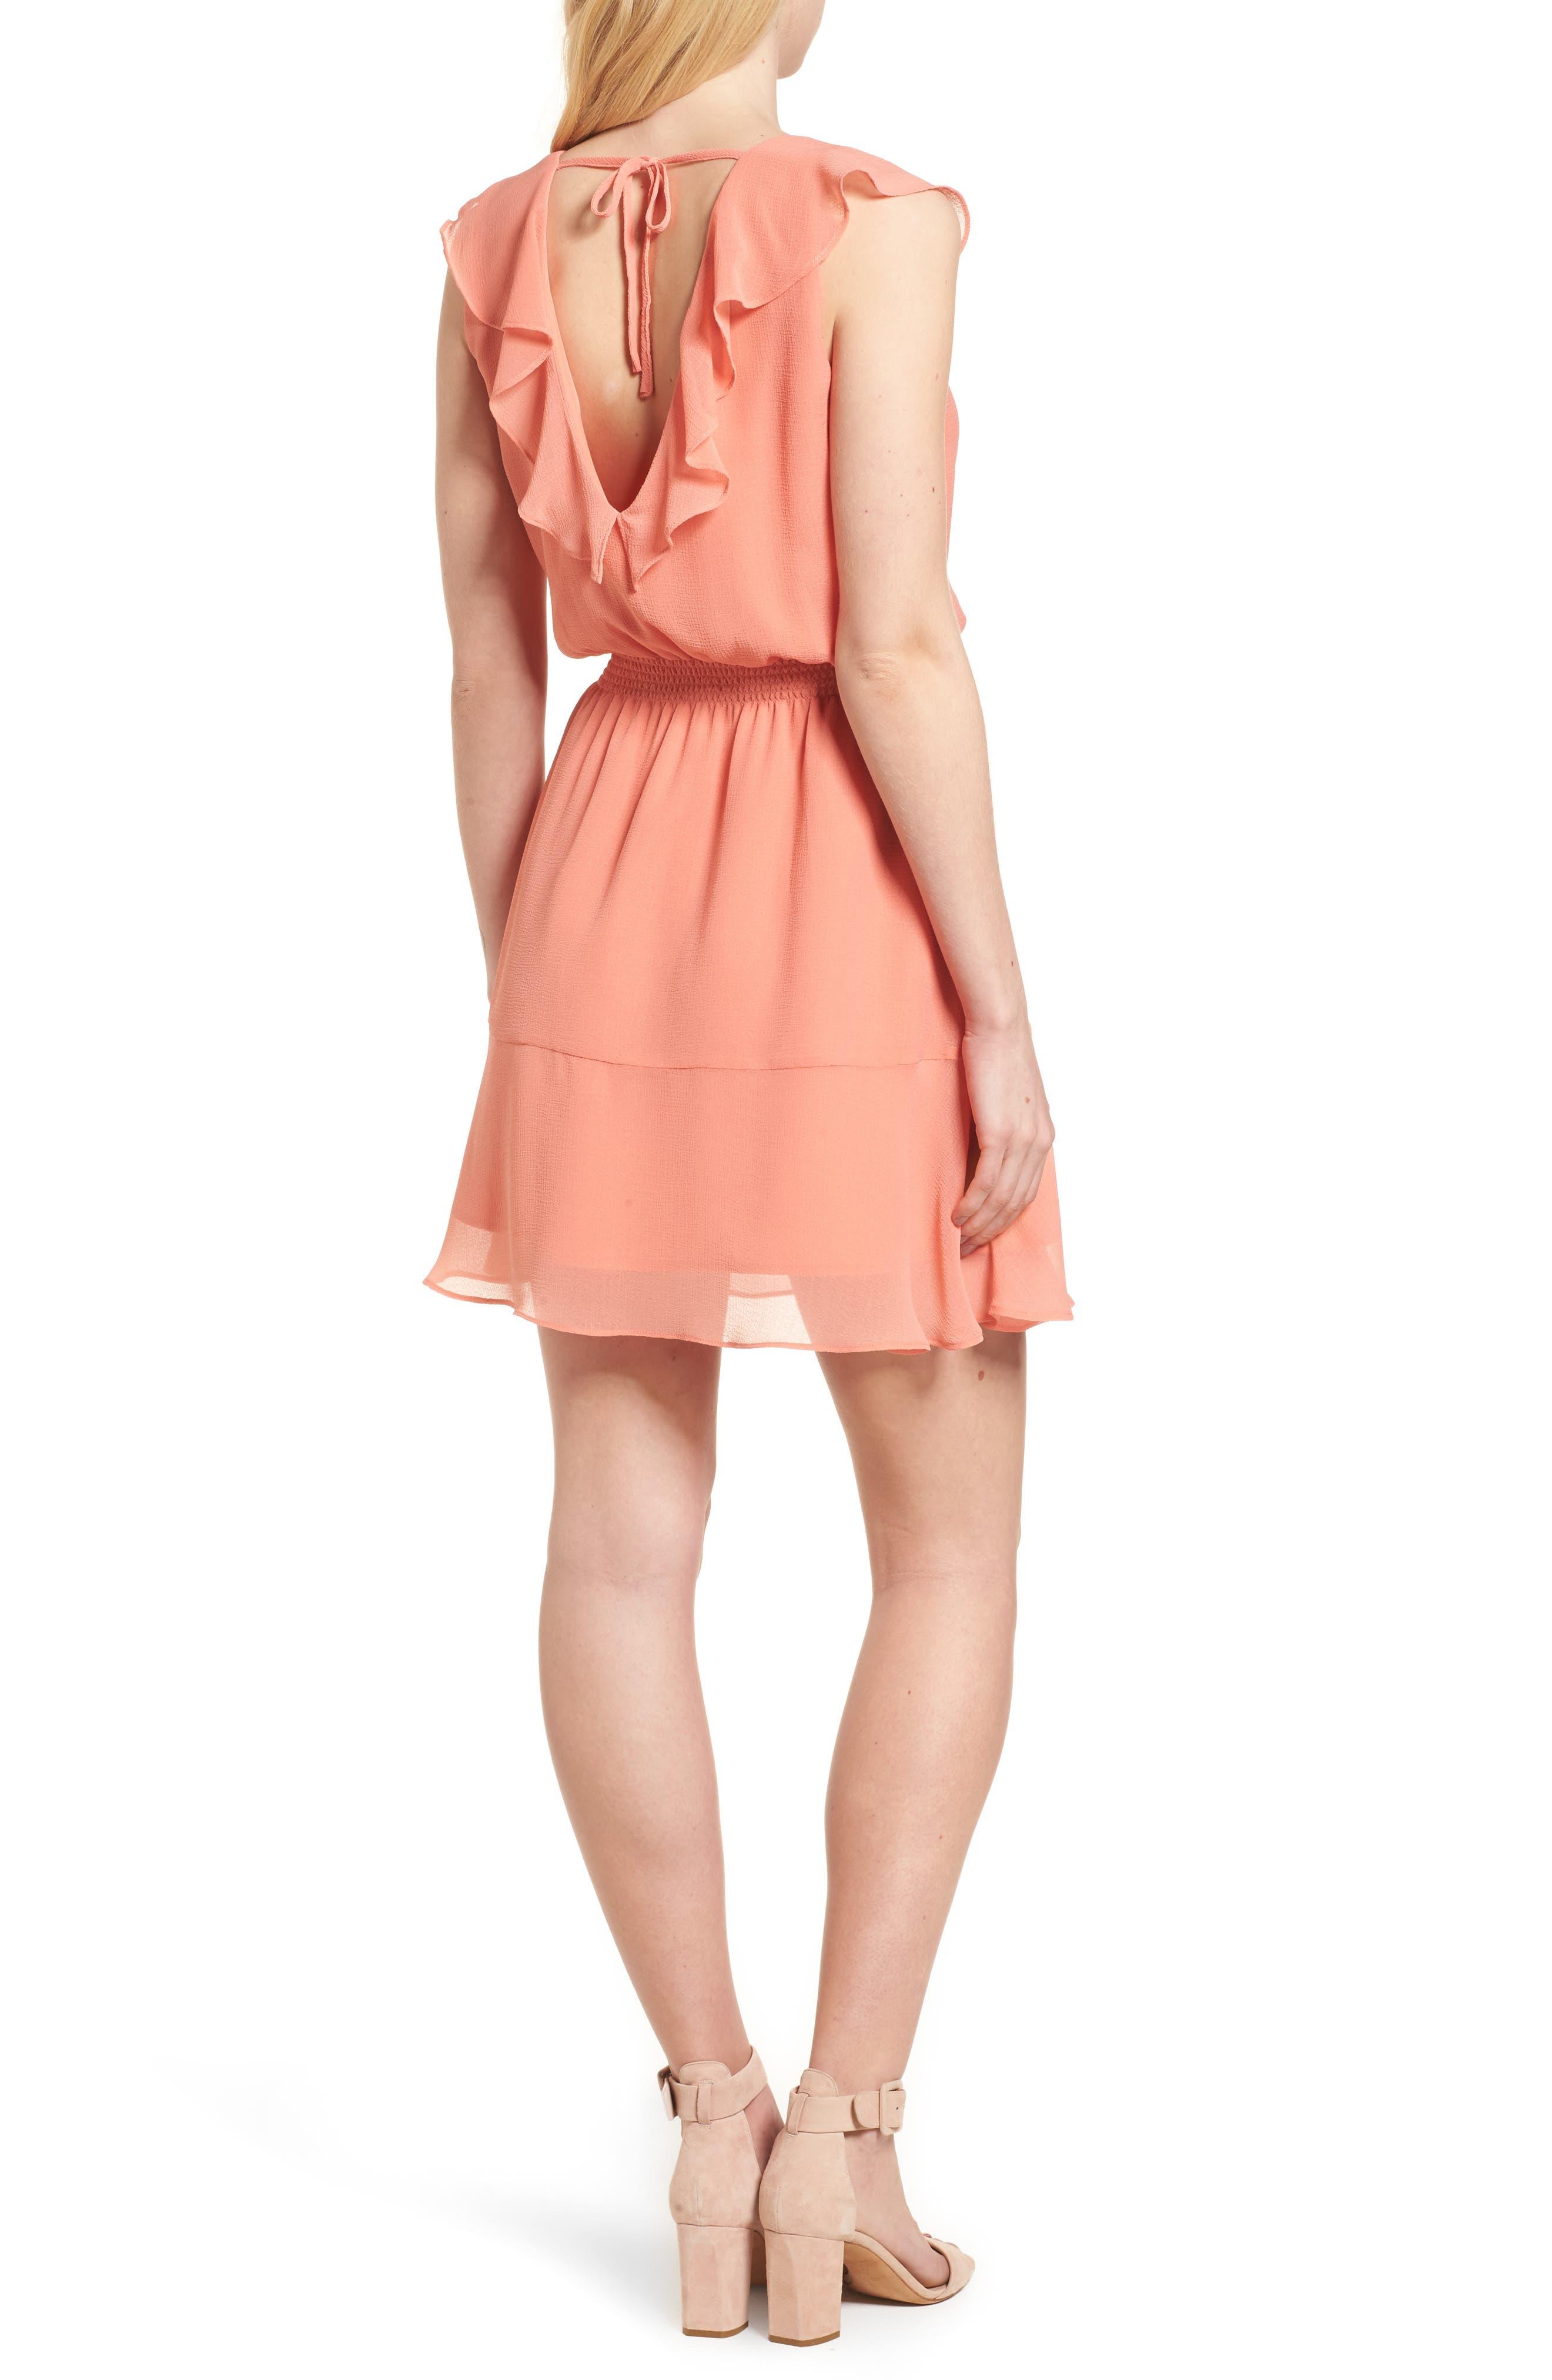 Iniko Blouson Dress,                             Alternate thumbnail 2, color,                             Spring Coral